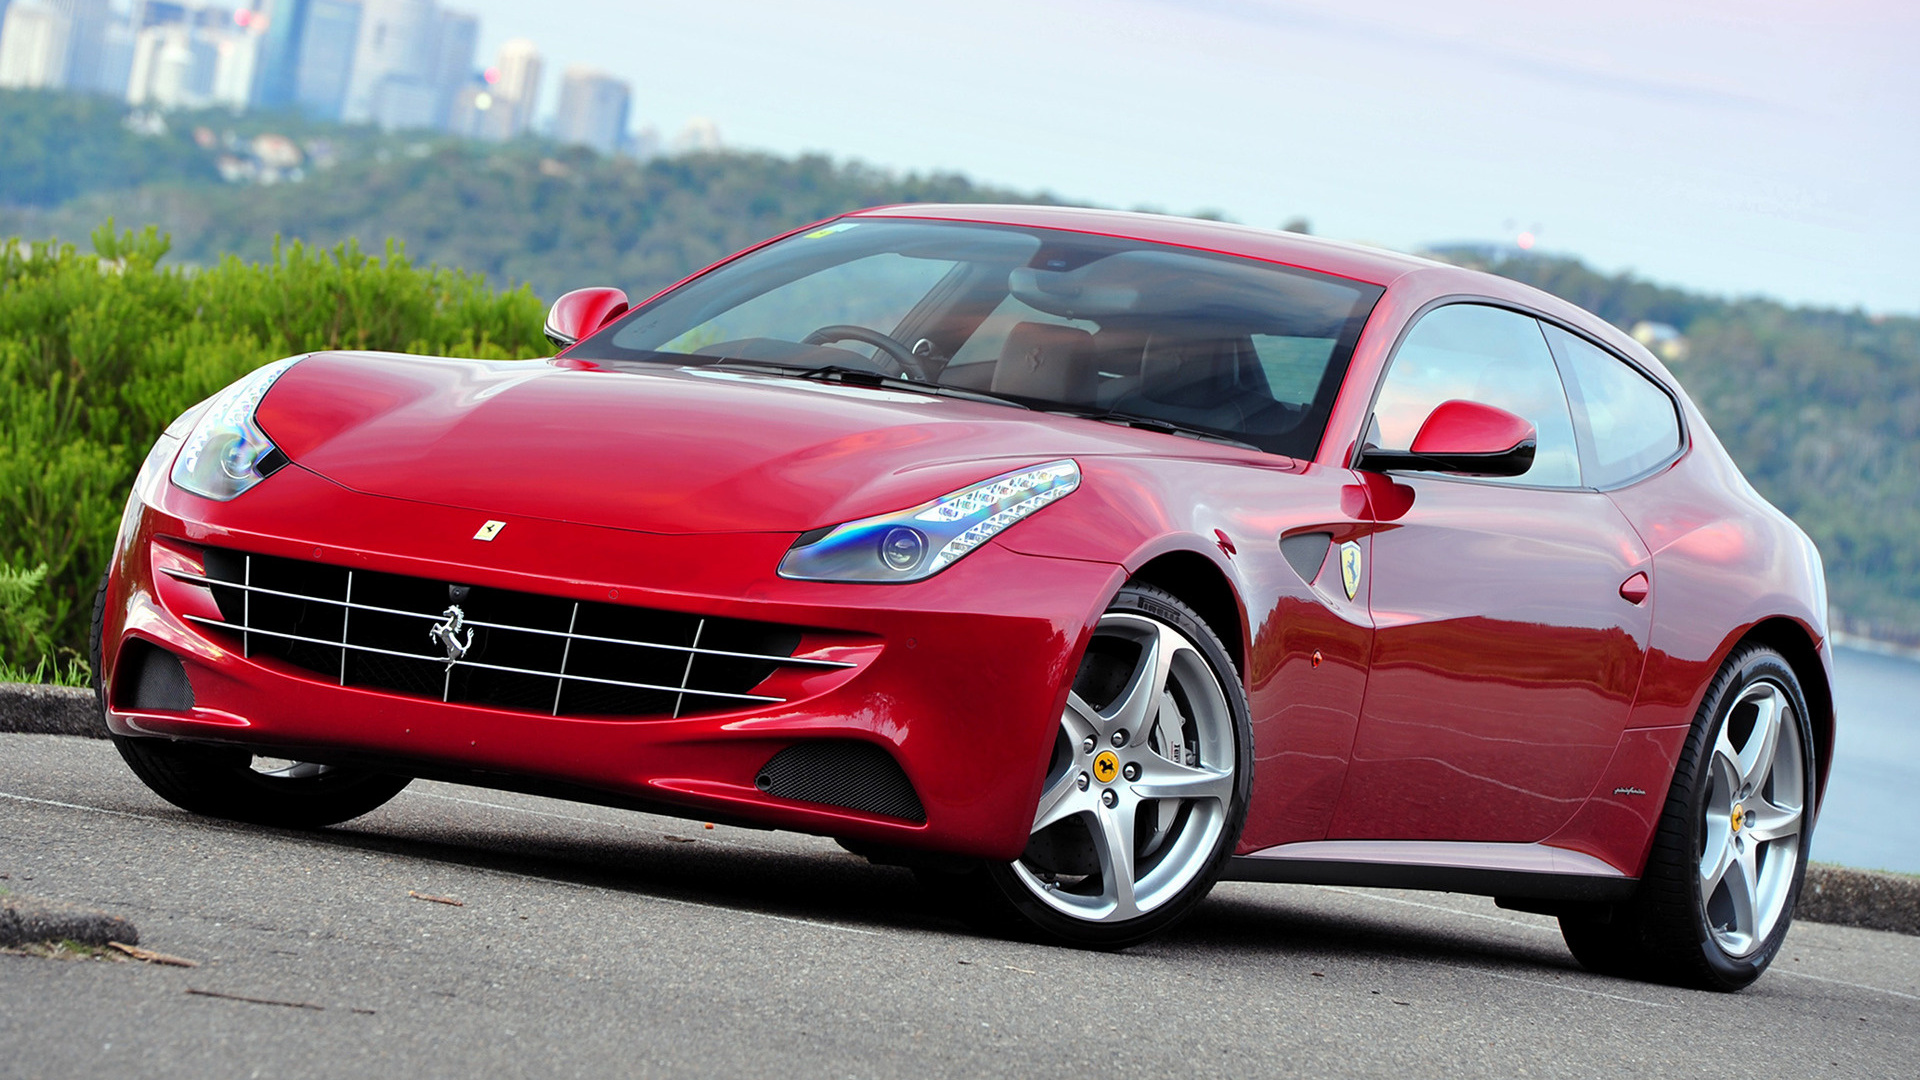 2012 Ferrari Ff Au Wallpapers And Hd Images Car Pixel